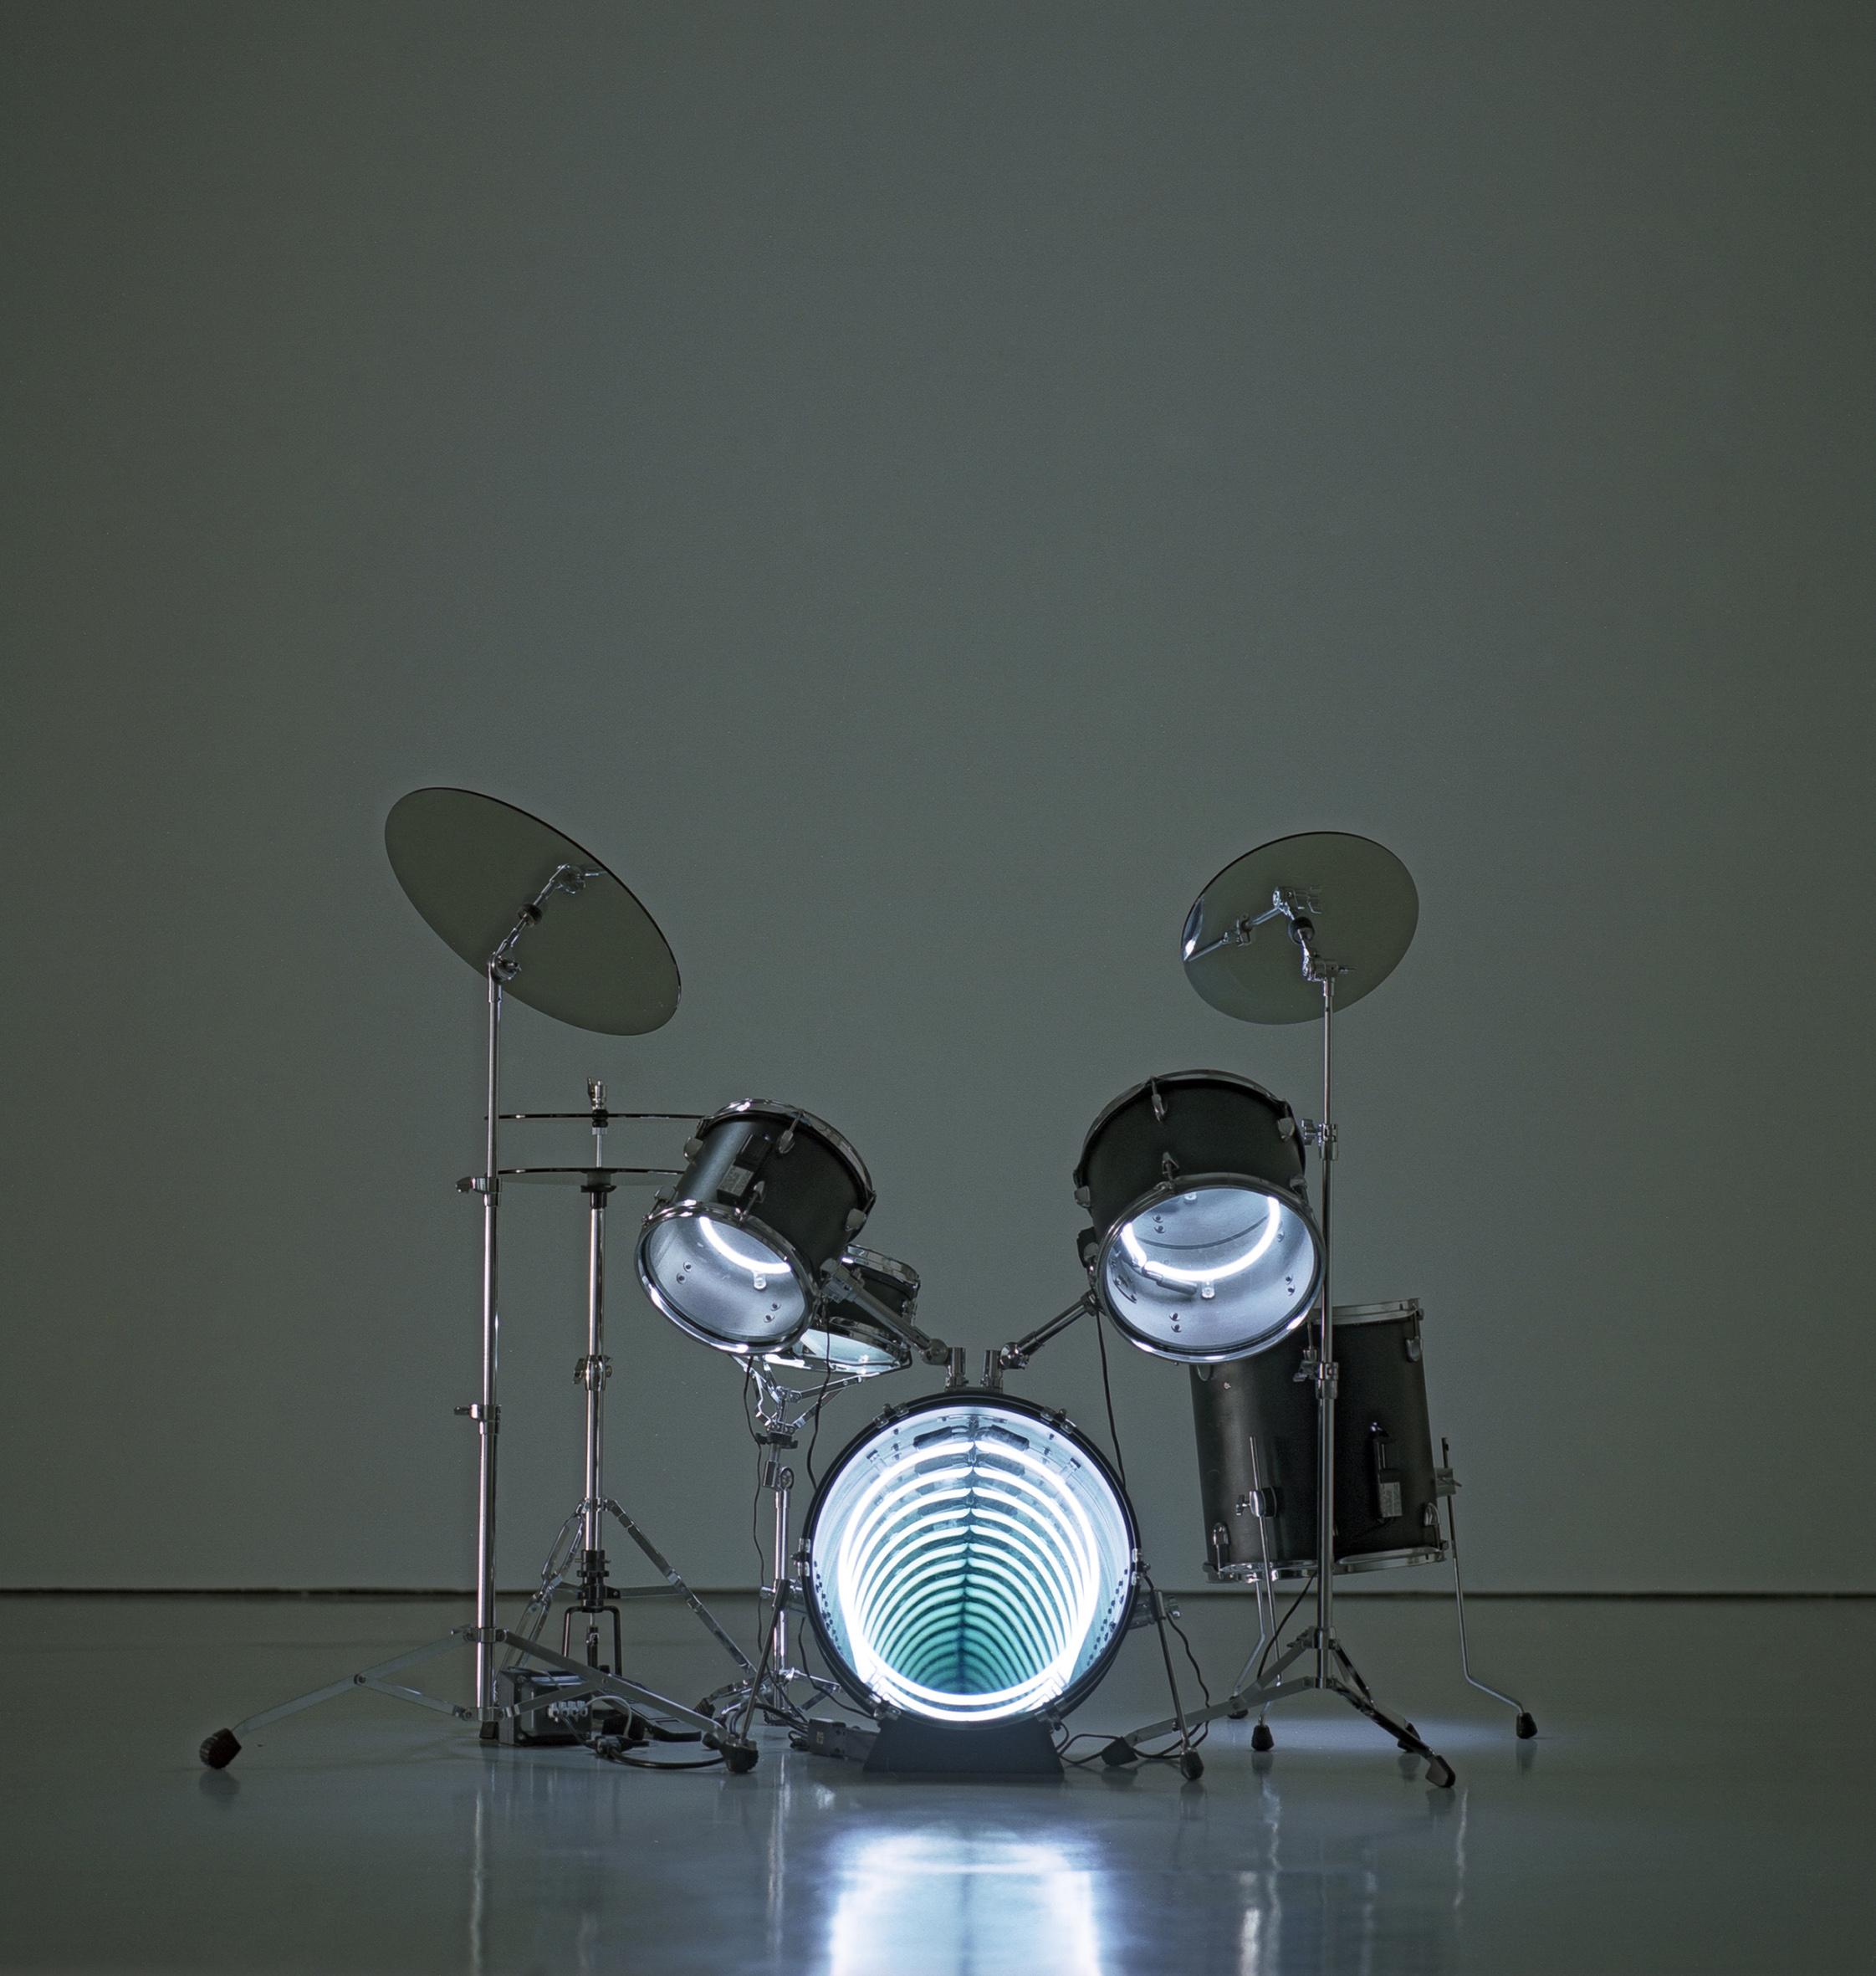 Drums, 2009  Neon lighting, plywood, metal, mirror, electric energy  48 x 63 x 48 in.  Photo : Jorge Martinez Muñoz  Courtesy Galerie Daniel Templon, Paris and Bruxelles.